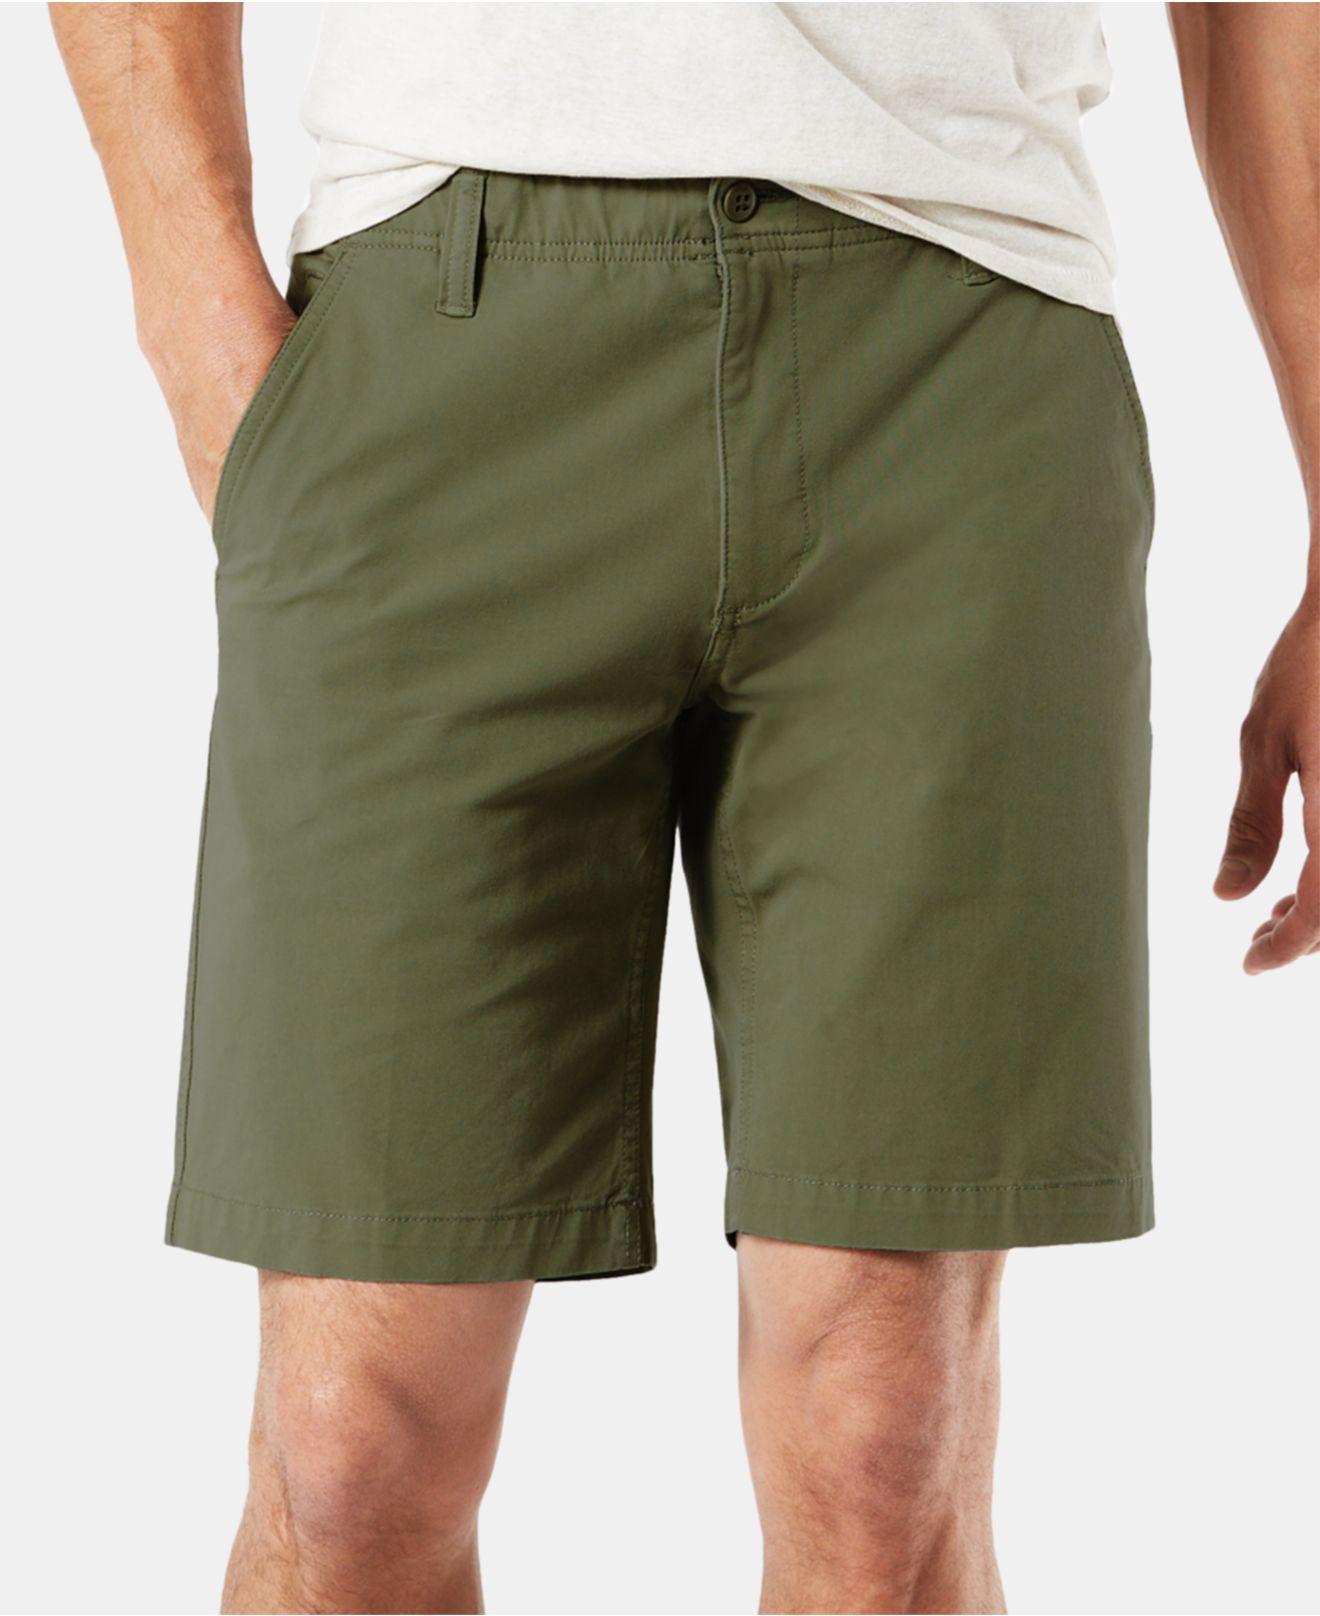 1e42494effb1 Dockers. Men's Green Straight Fit Chino Smart 360 Flex 4-way Stretch 9.5